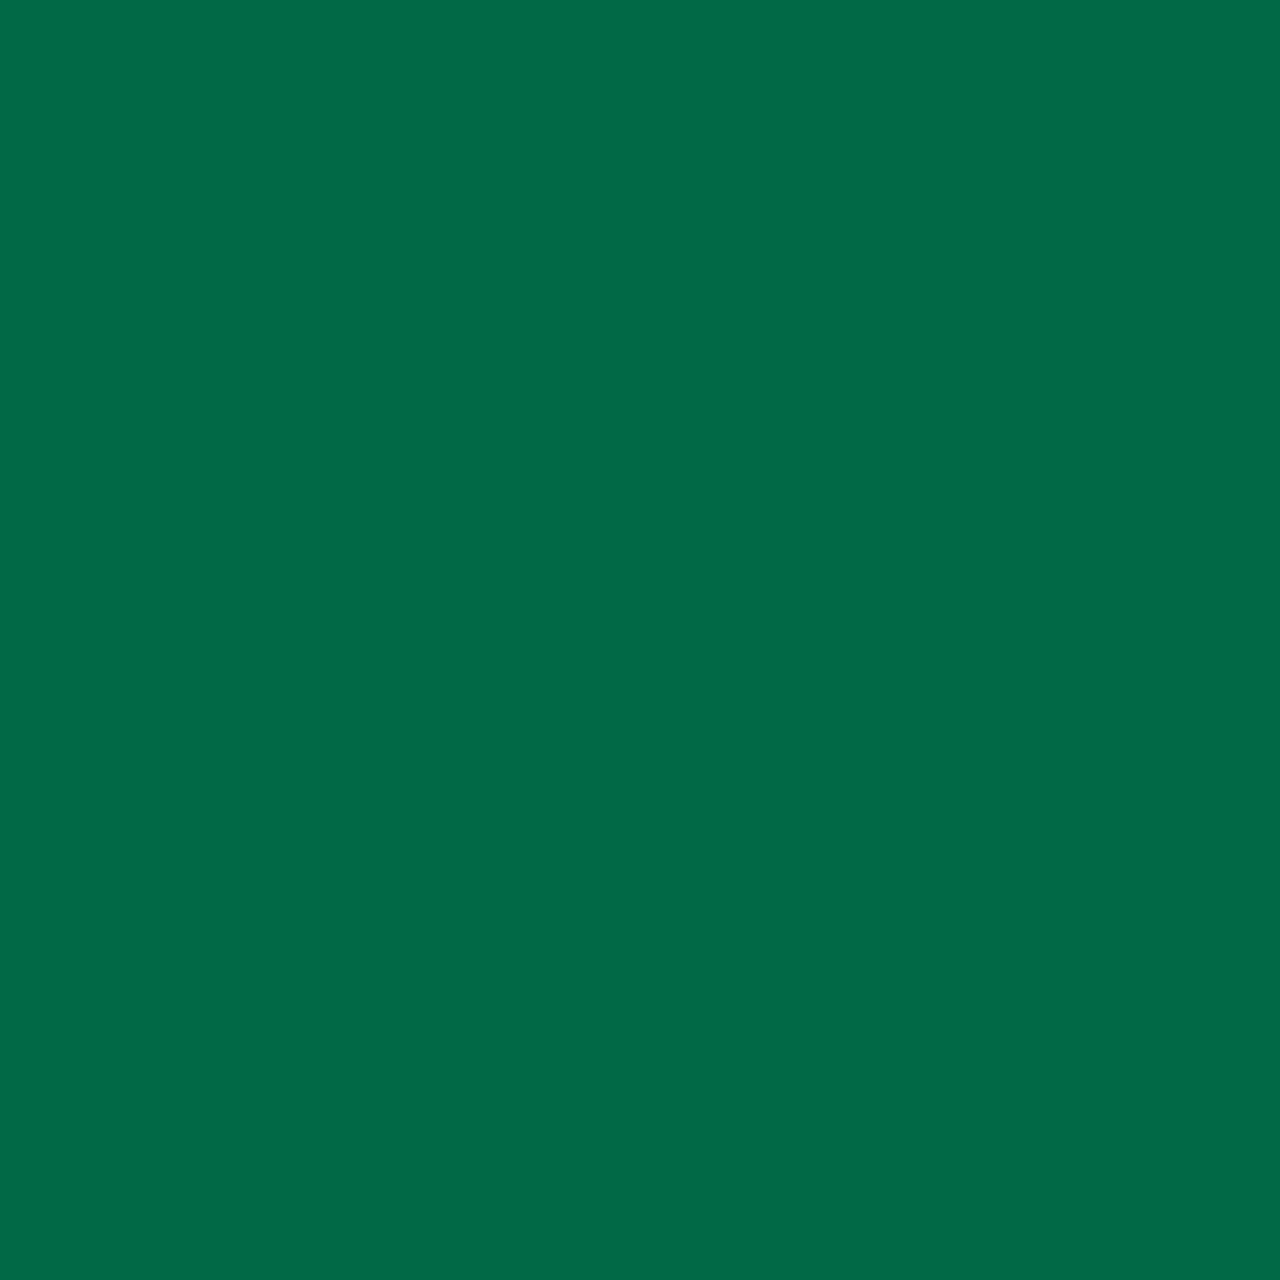 "#2004 Rosco Gels Roscolux Storaro Green, 20x24"""